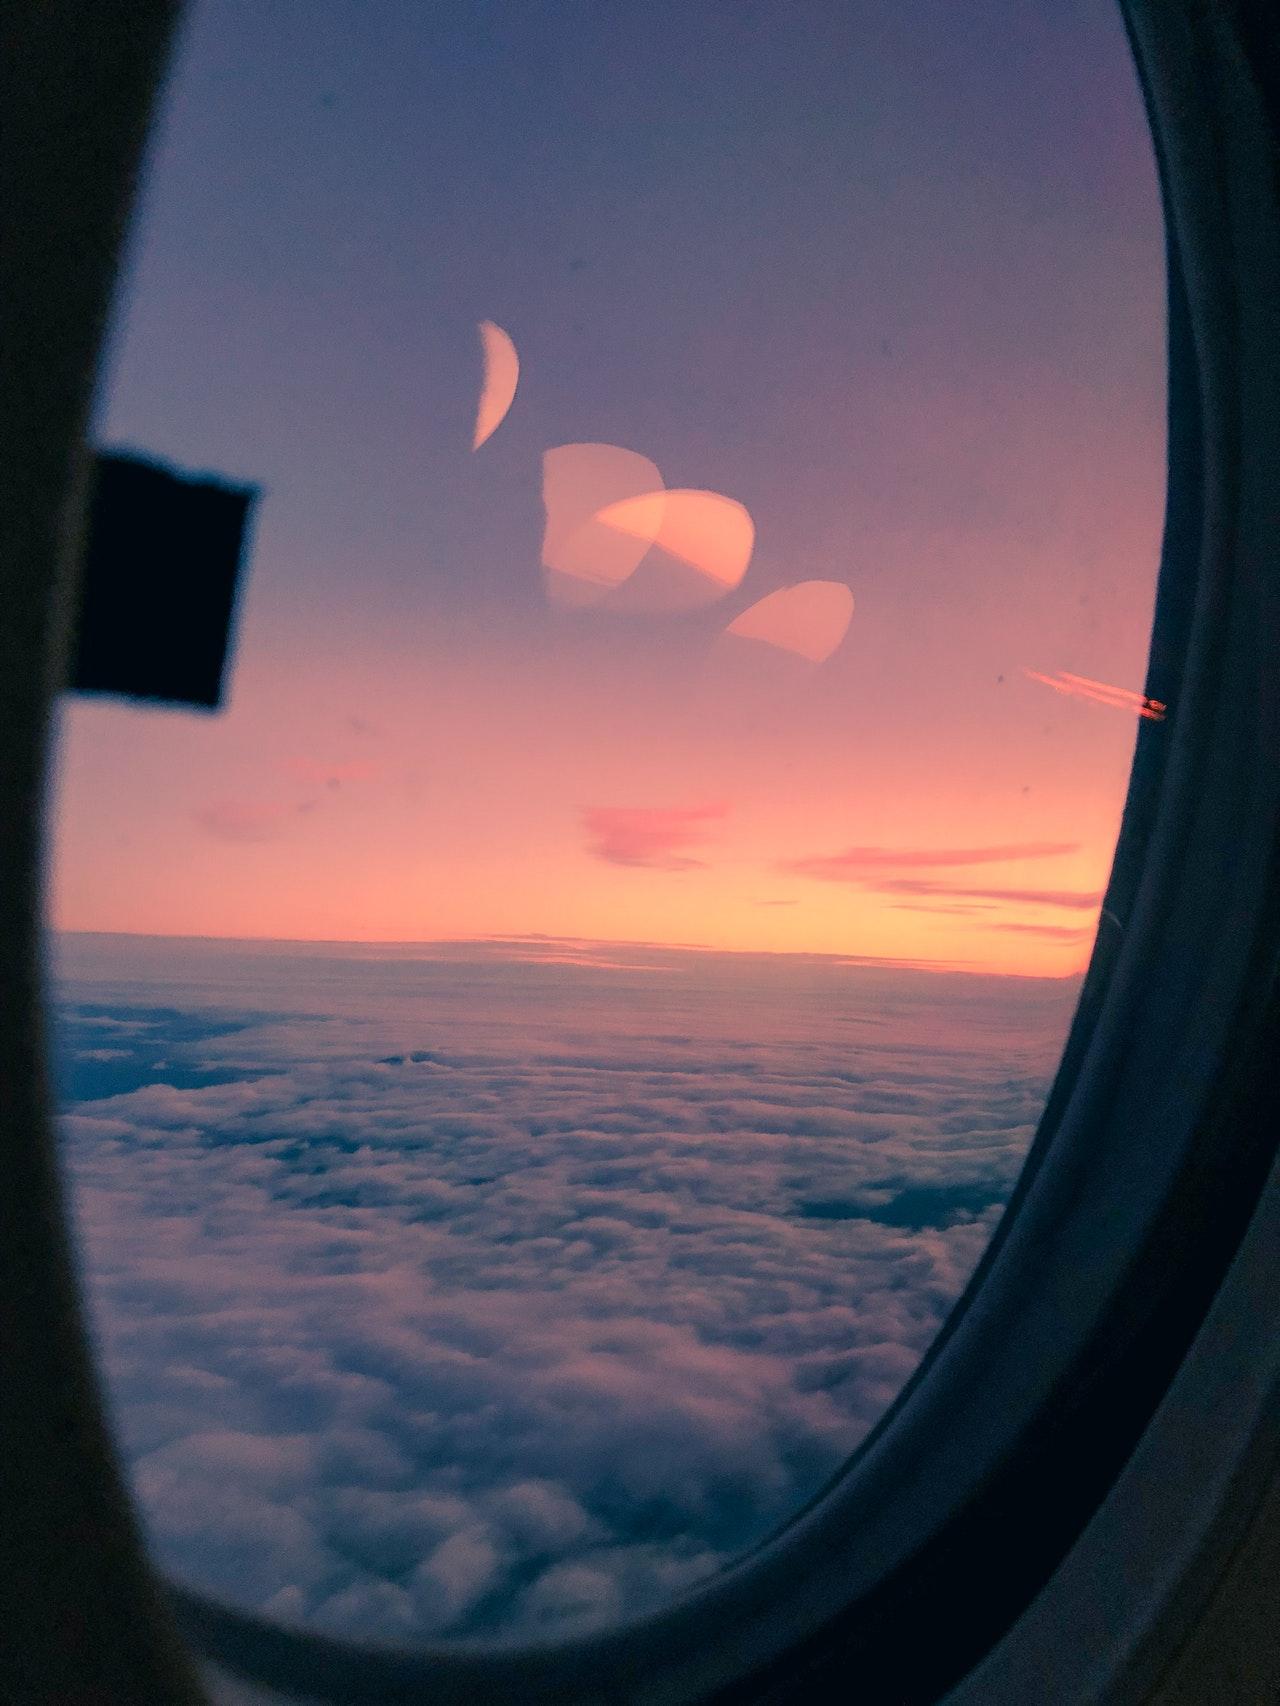 airplane-window-view